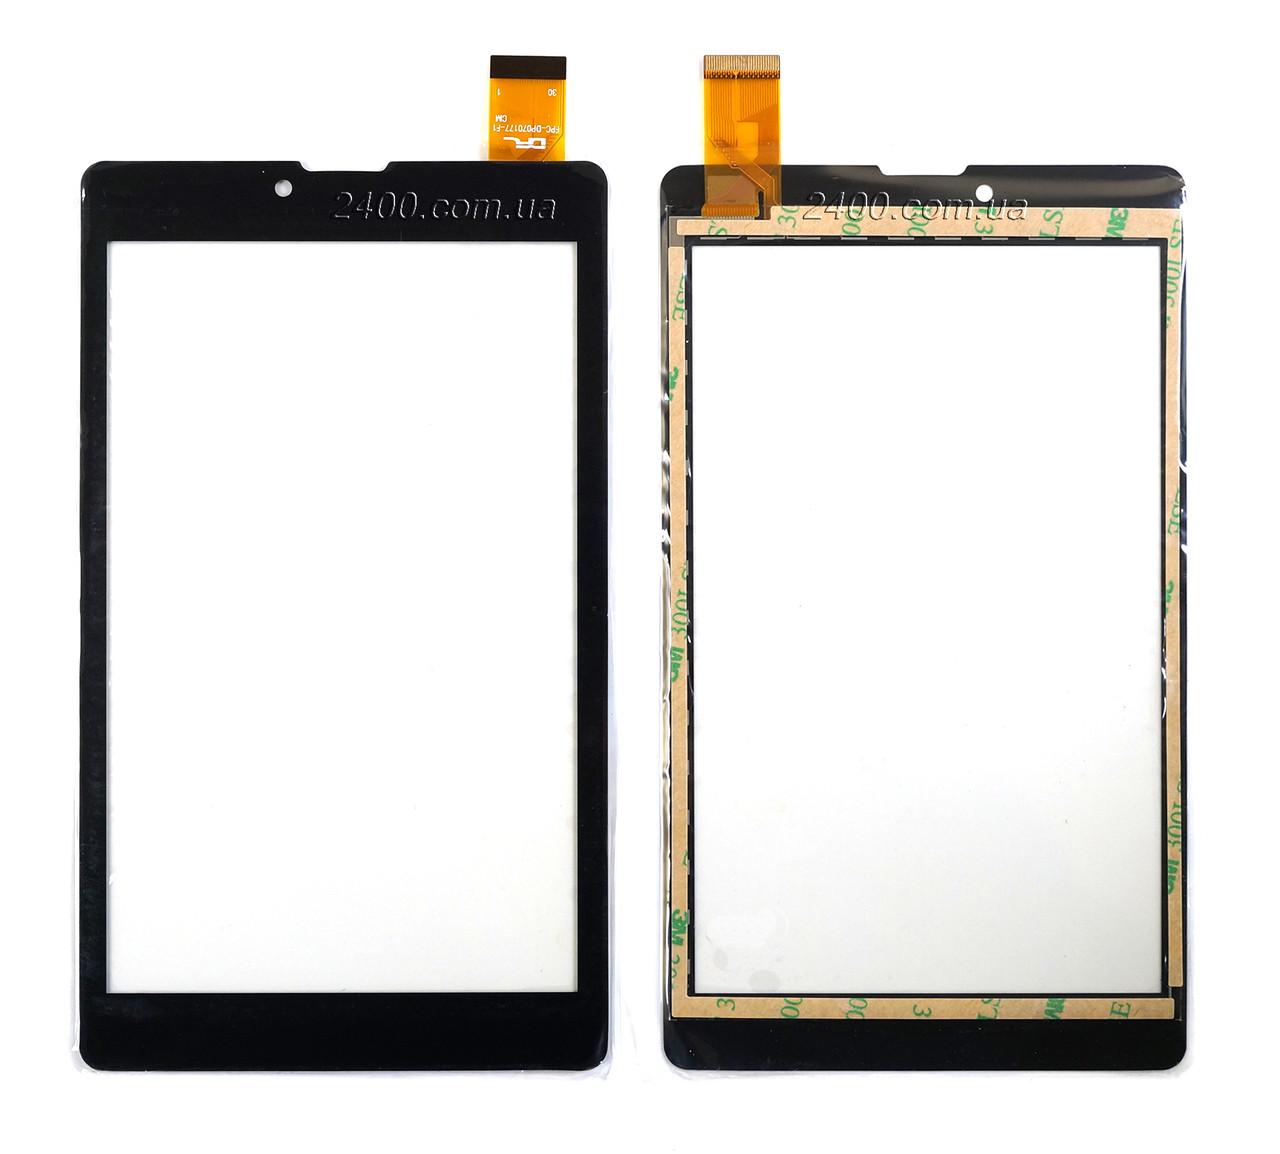 Сенсор, тачскрин Impression ImPAD M701, B701, B702 (черный) 30pin 184*106 мм, FPC-DP070177-F1